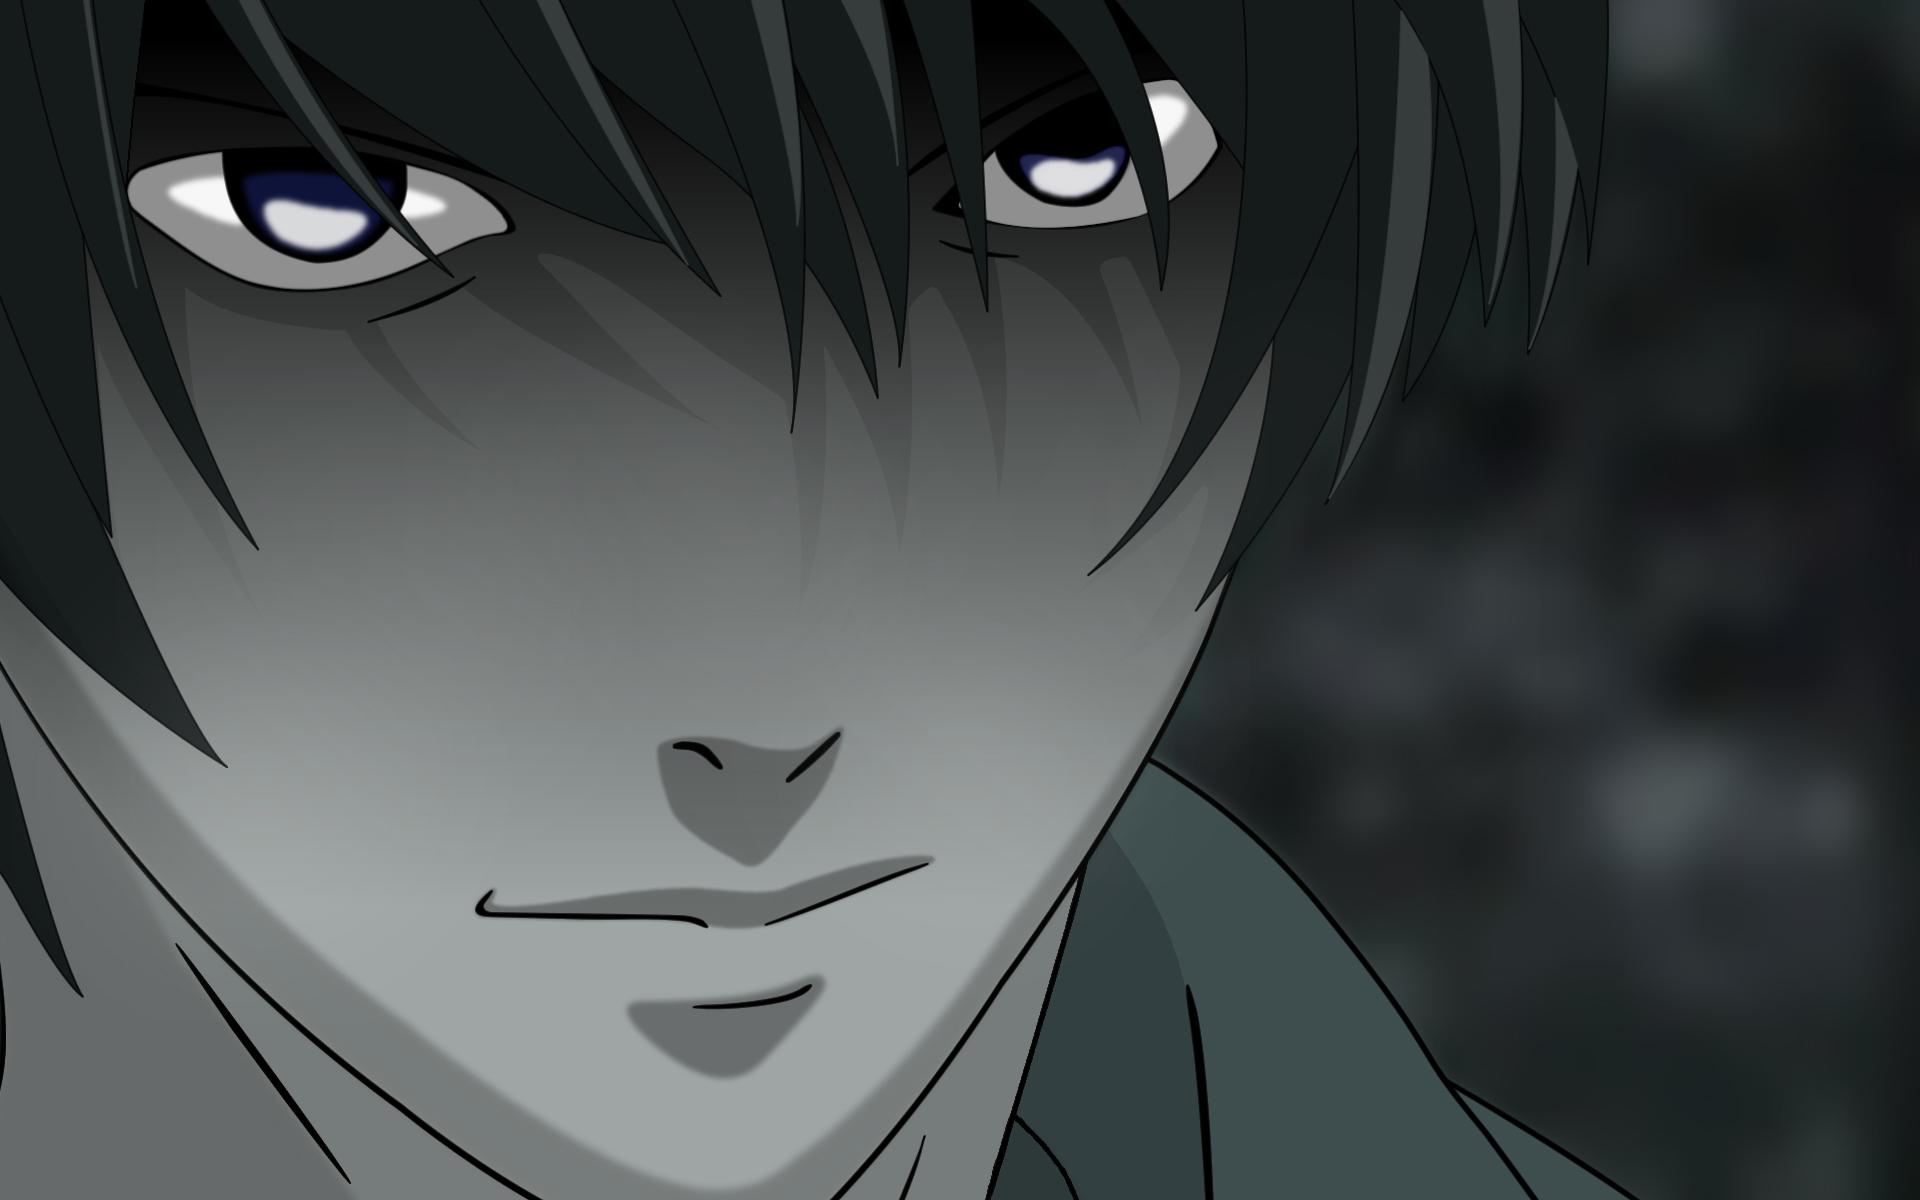 death note anime kira - photo #10